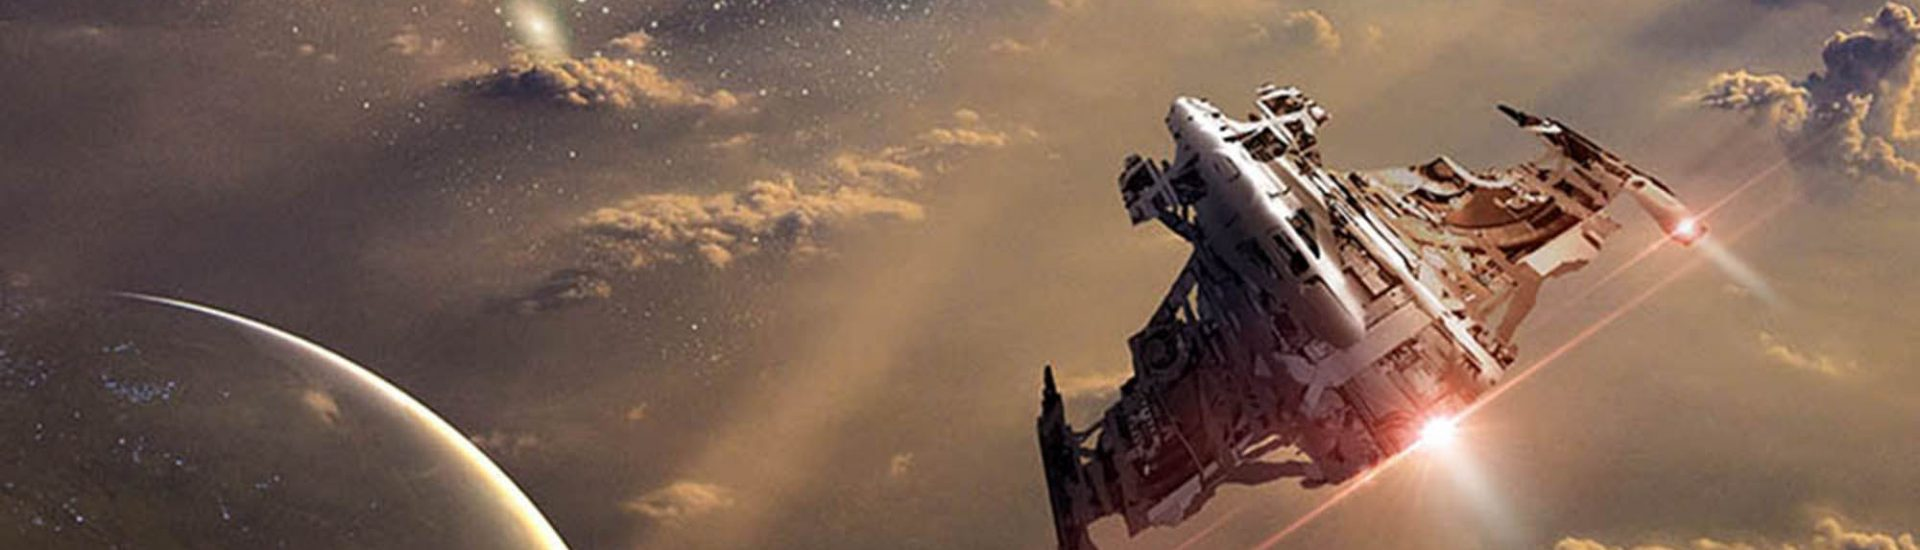 rymdopera tävling banner v2